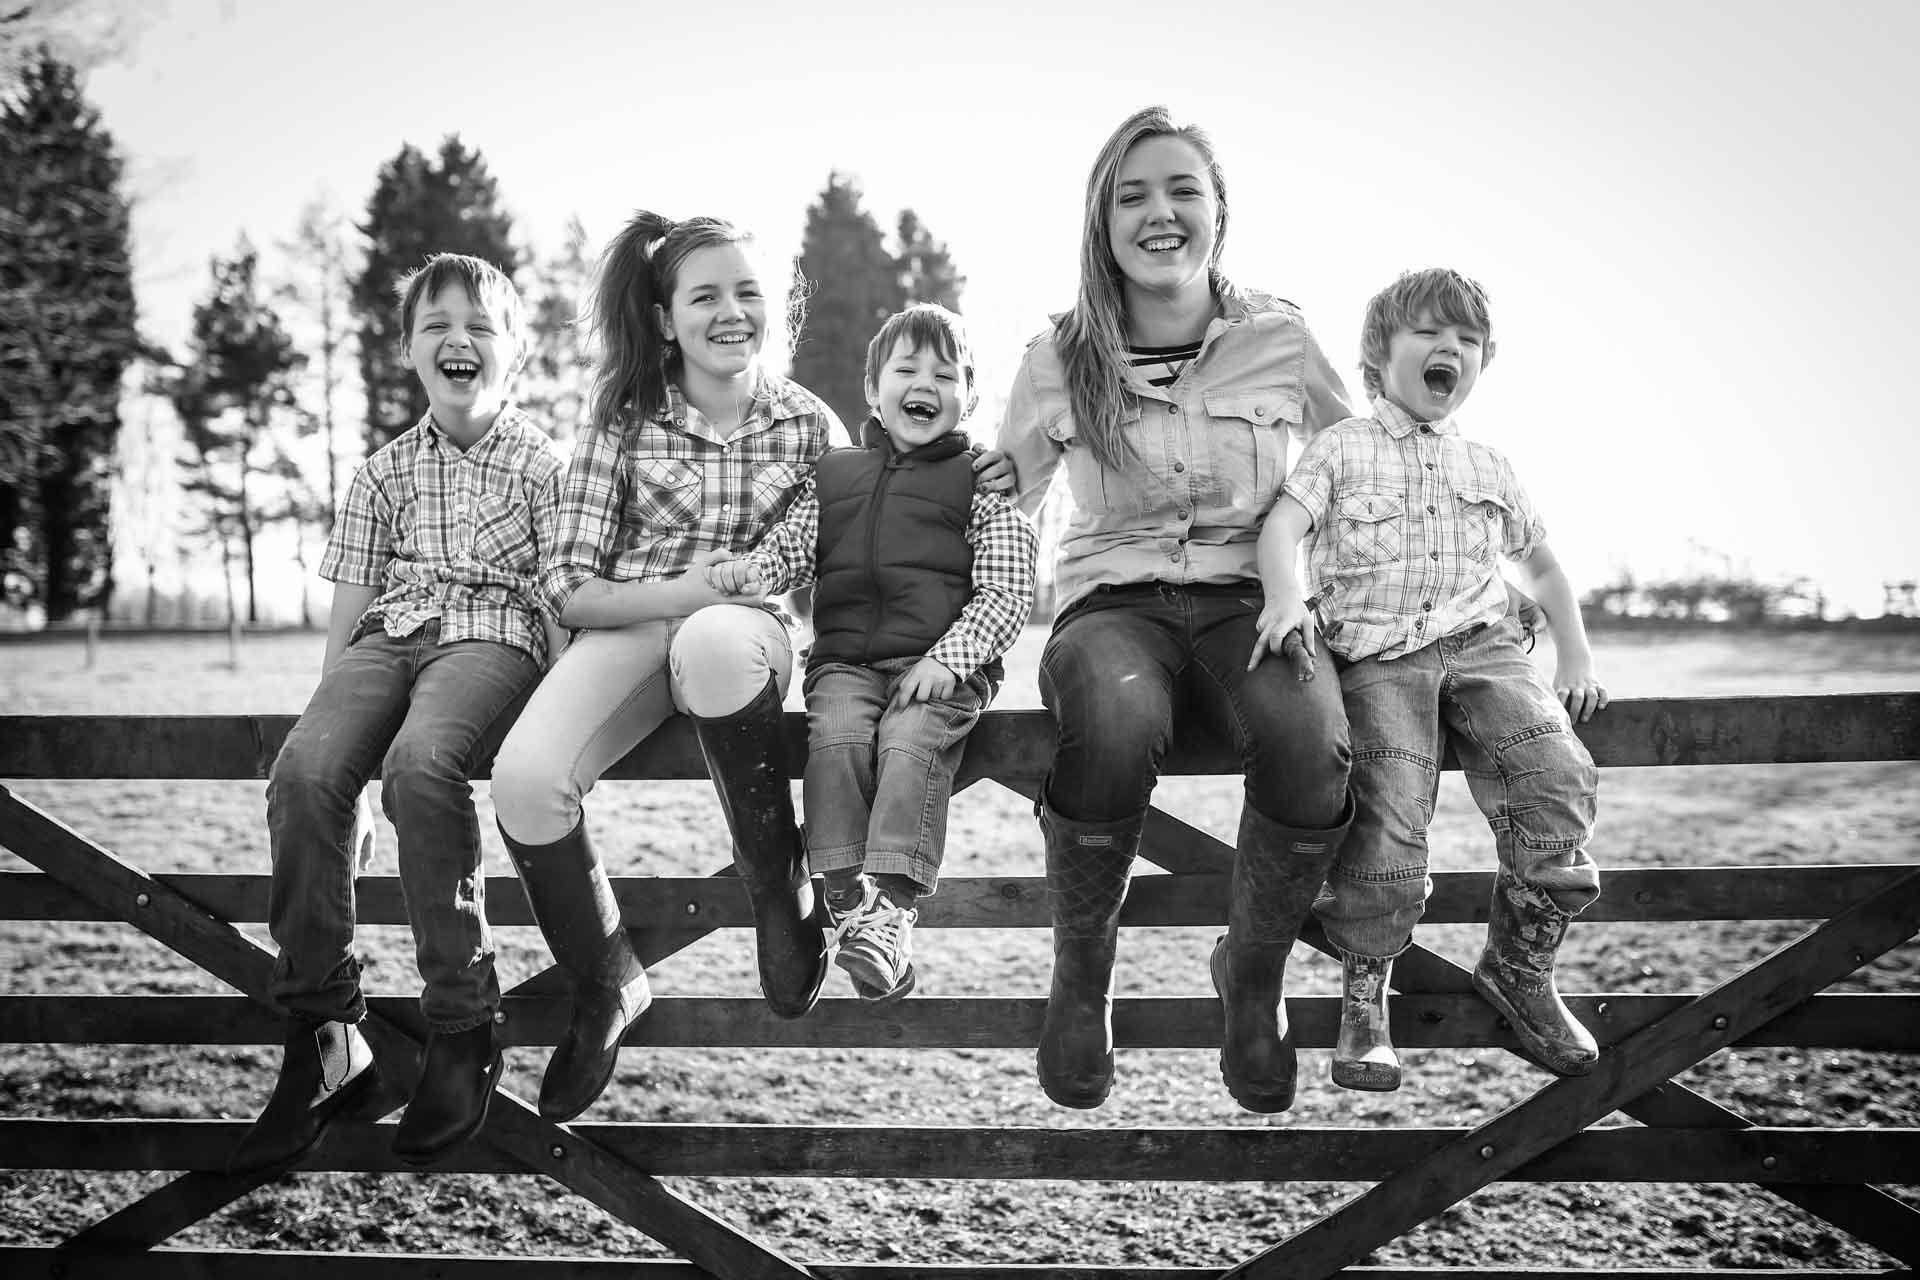 Joanna Eardley Portrait Photography - Fun Family Portraits Macclesfield